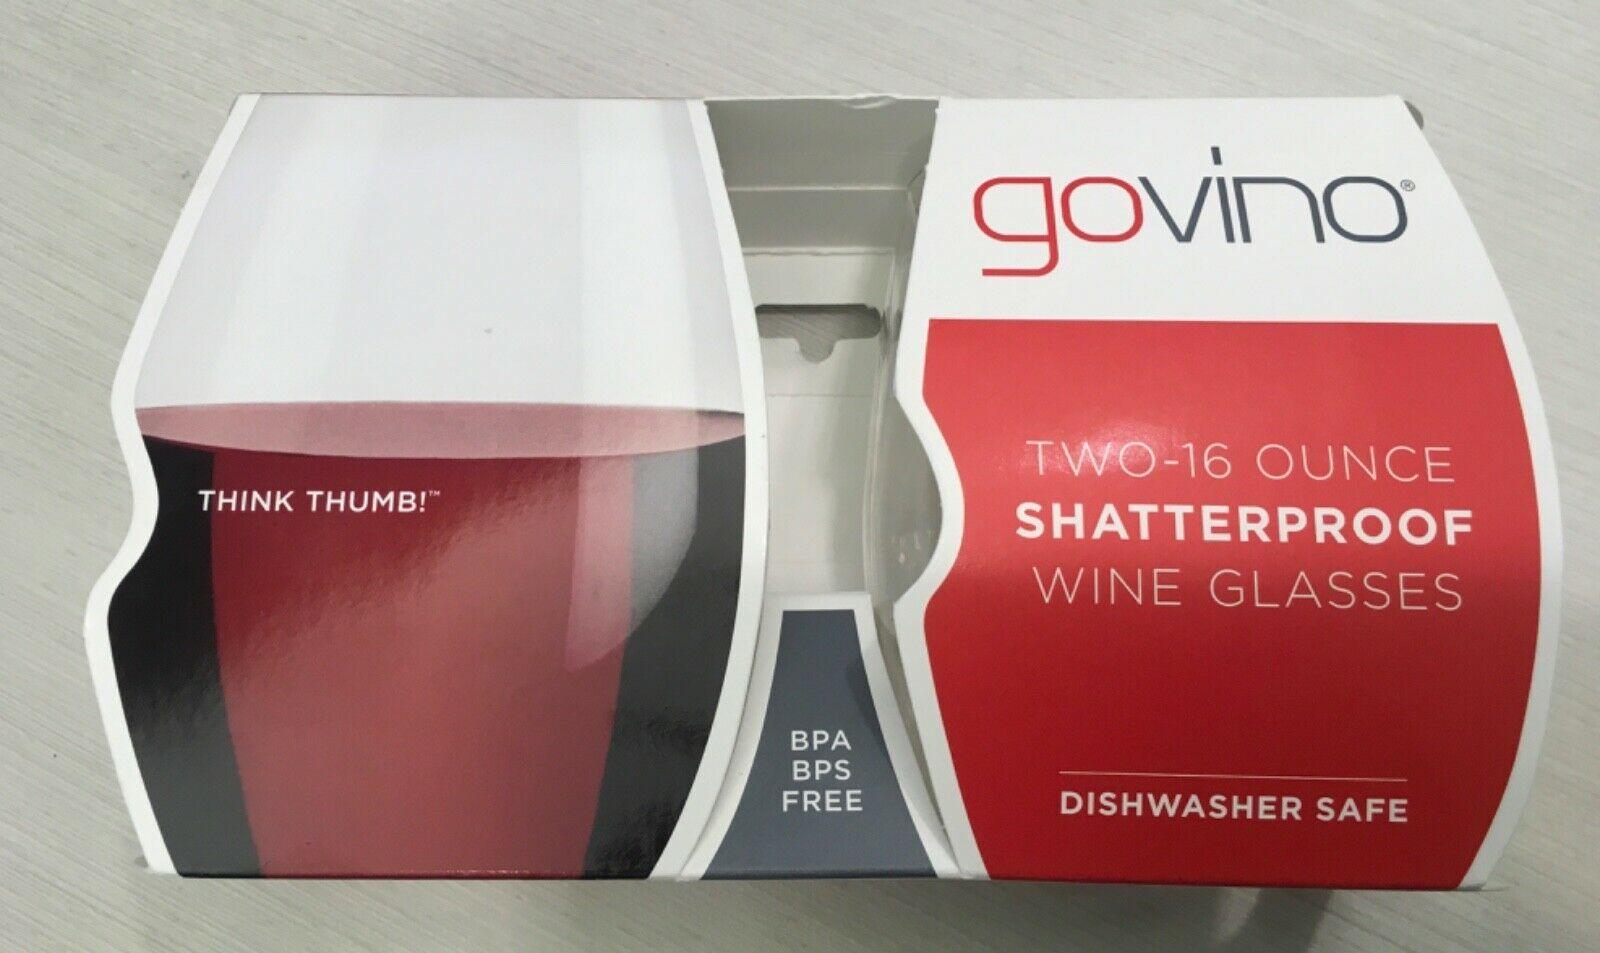 Govino Wine Plastic Glasses Set Of 2 Plus Wine Bottle Koozie Carrier Conoco Wine Glasses Ideas Of Wine Glasses Wineglasses Glass Wine Govino Wine Glasses Personalized Wine Glasses